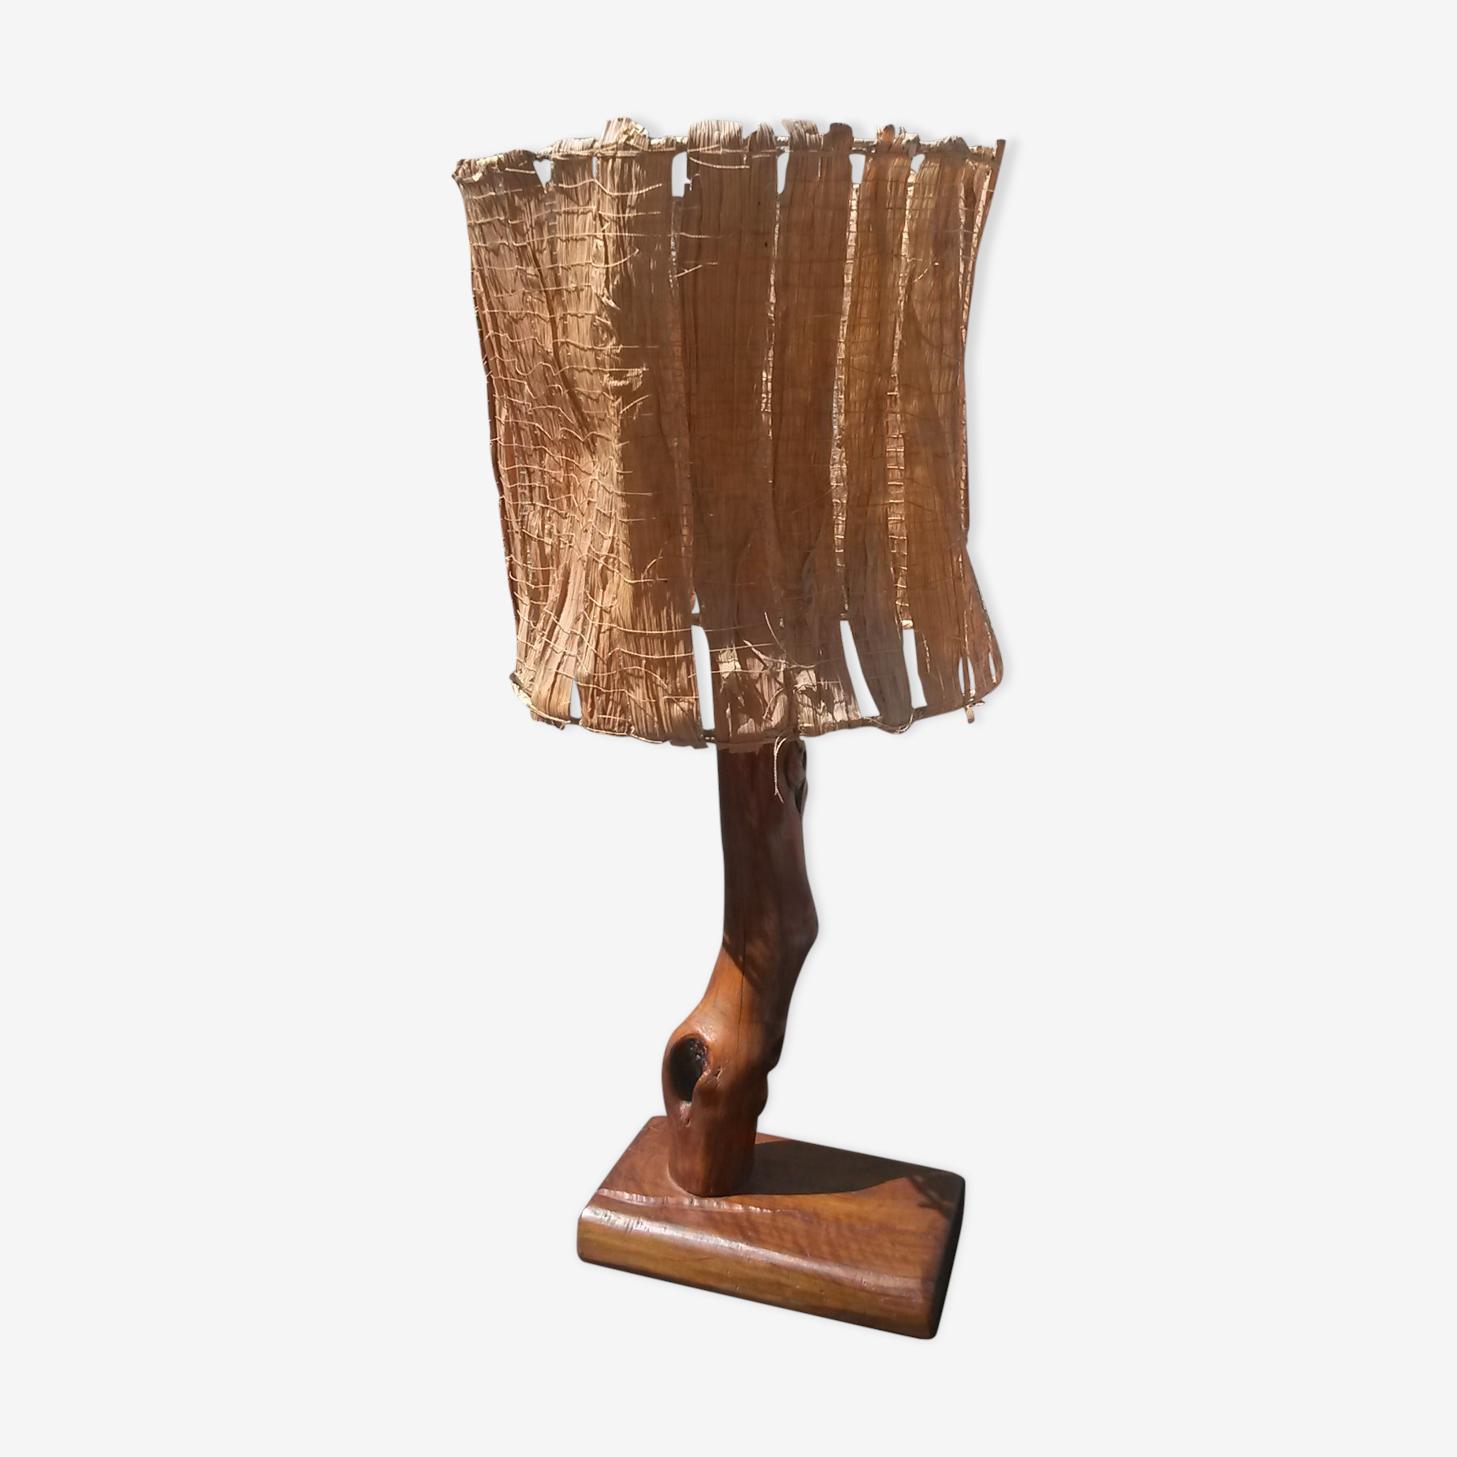 Lampe brutaliste en bois 1970